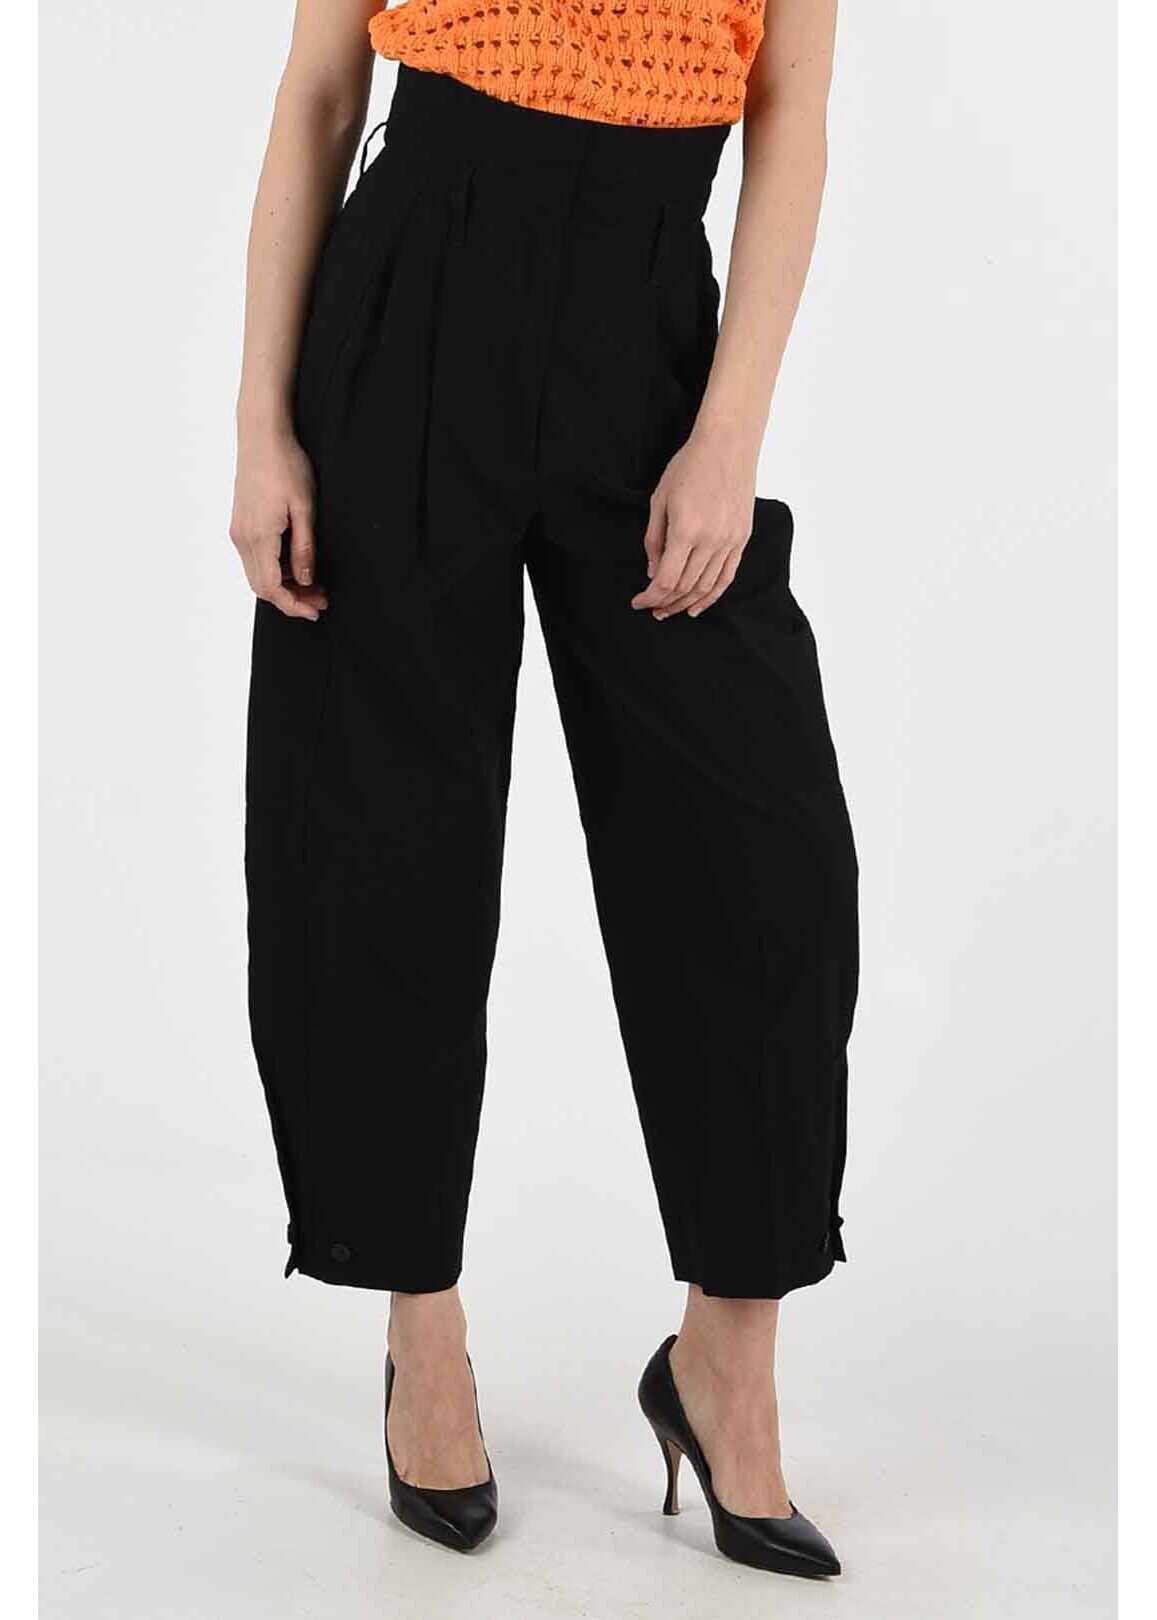 Givenchy high-rise waist pants BLACK